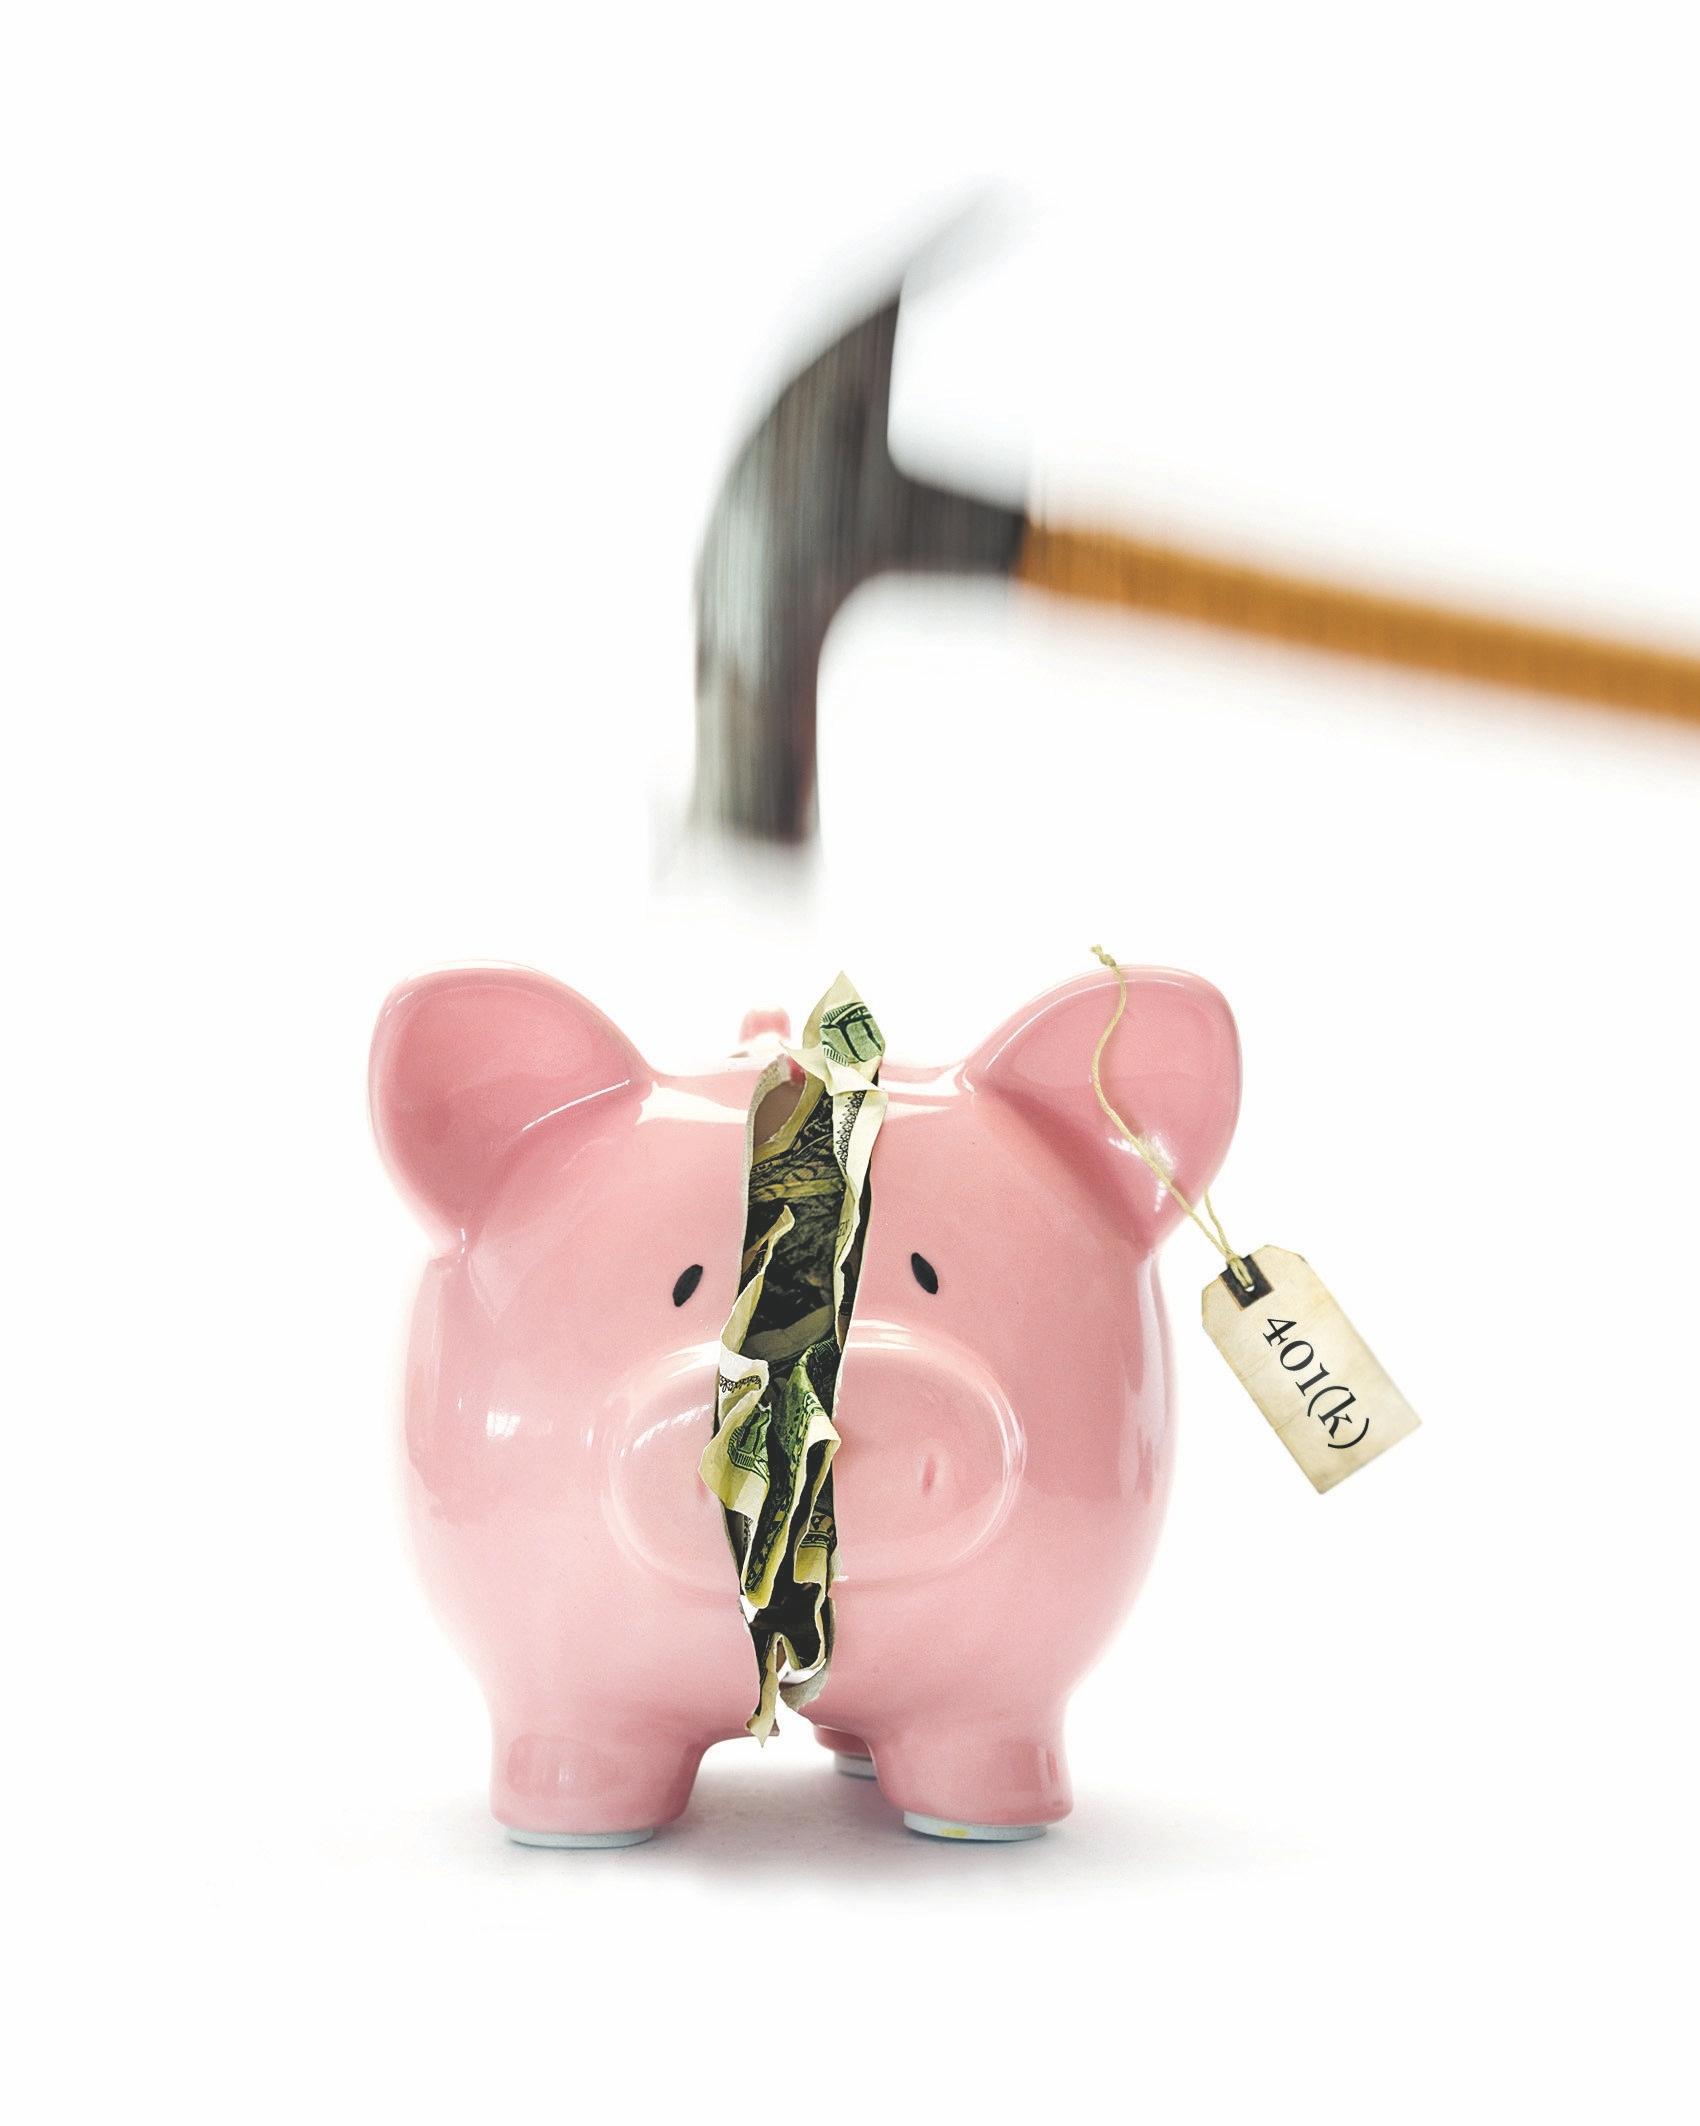 Hammer breaking piggy bank with money inside on white background